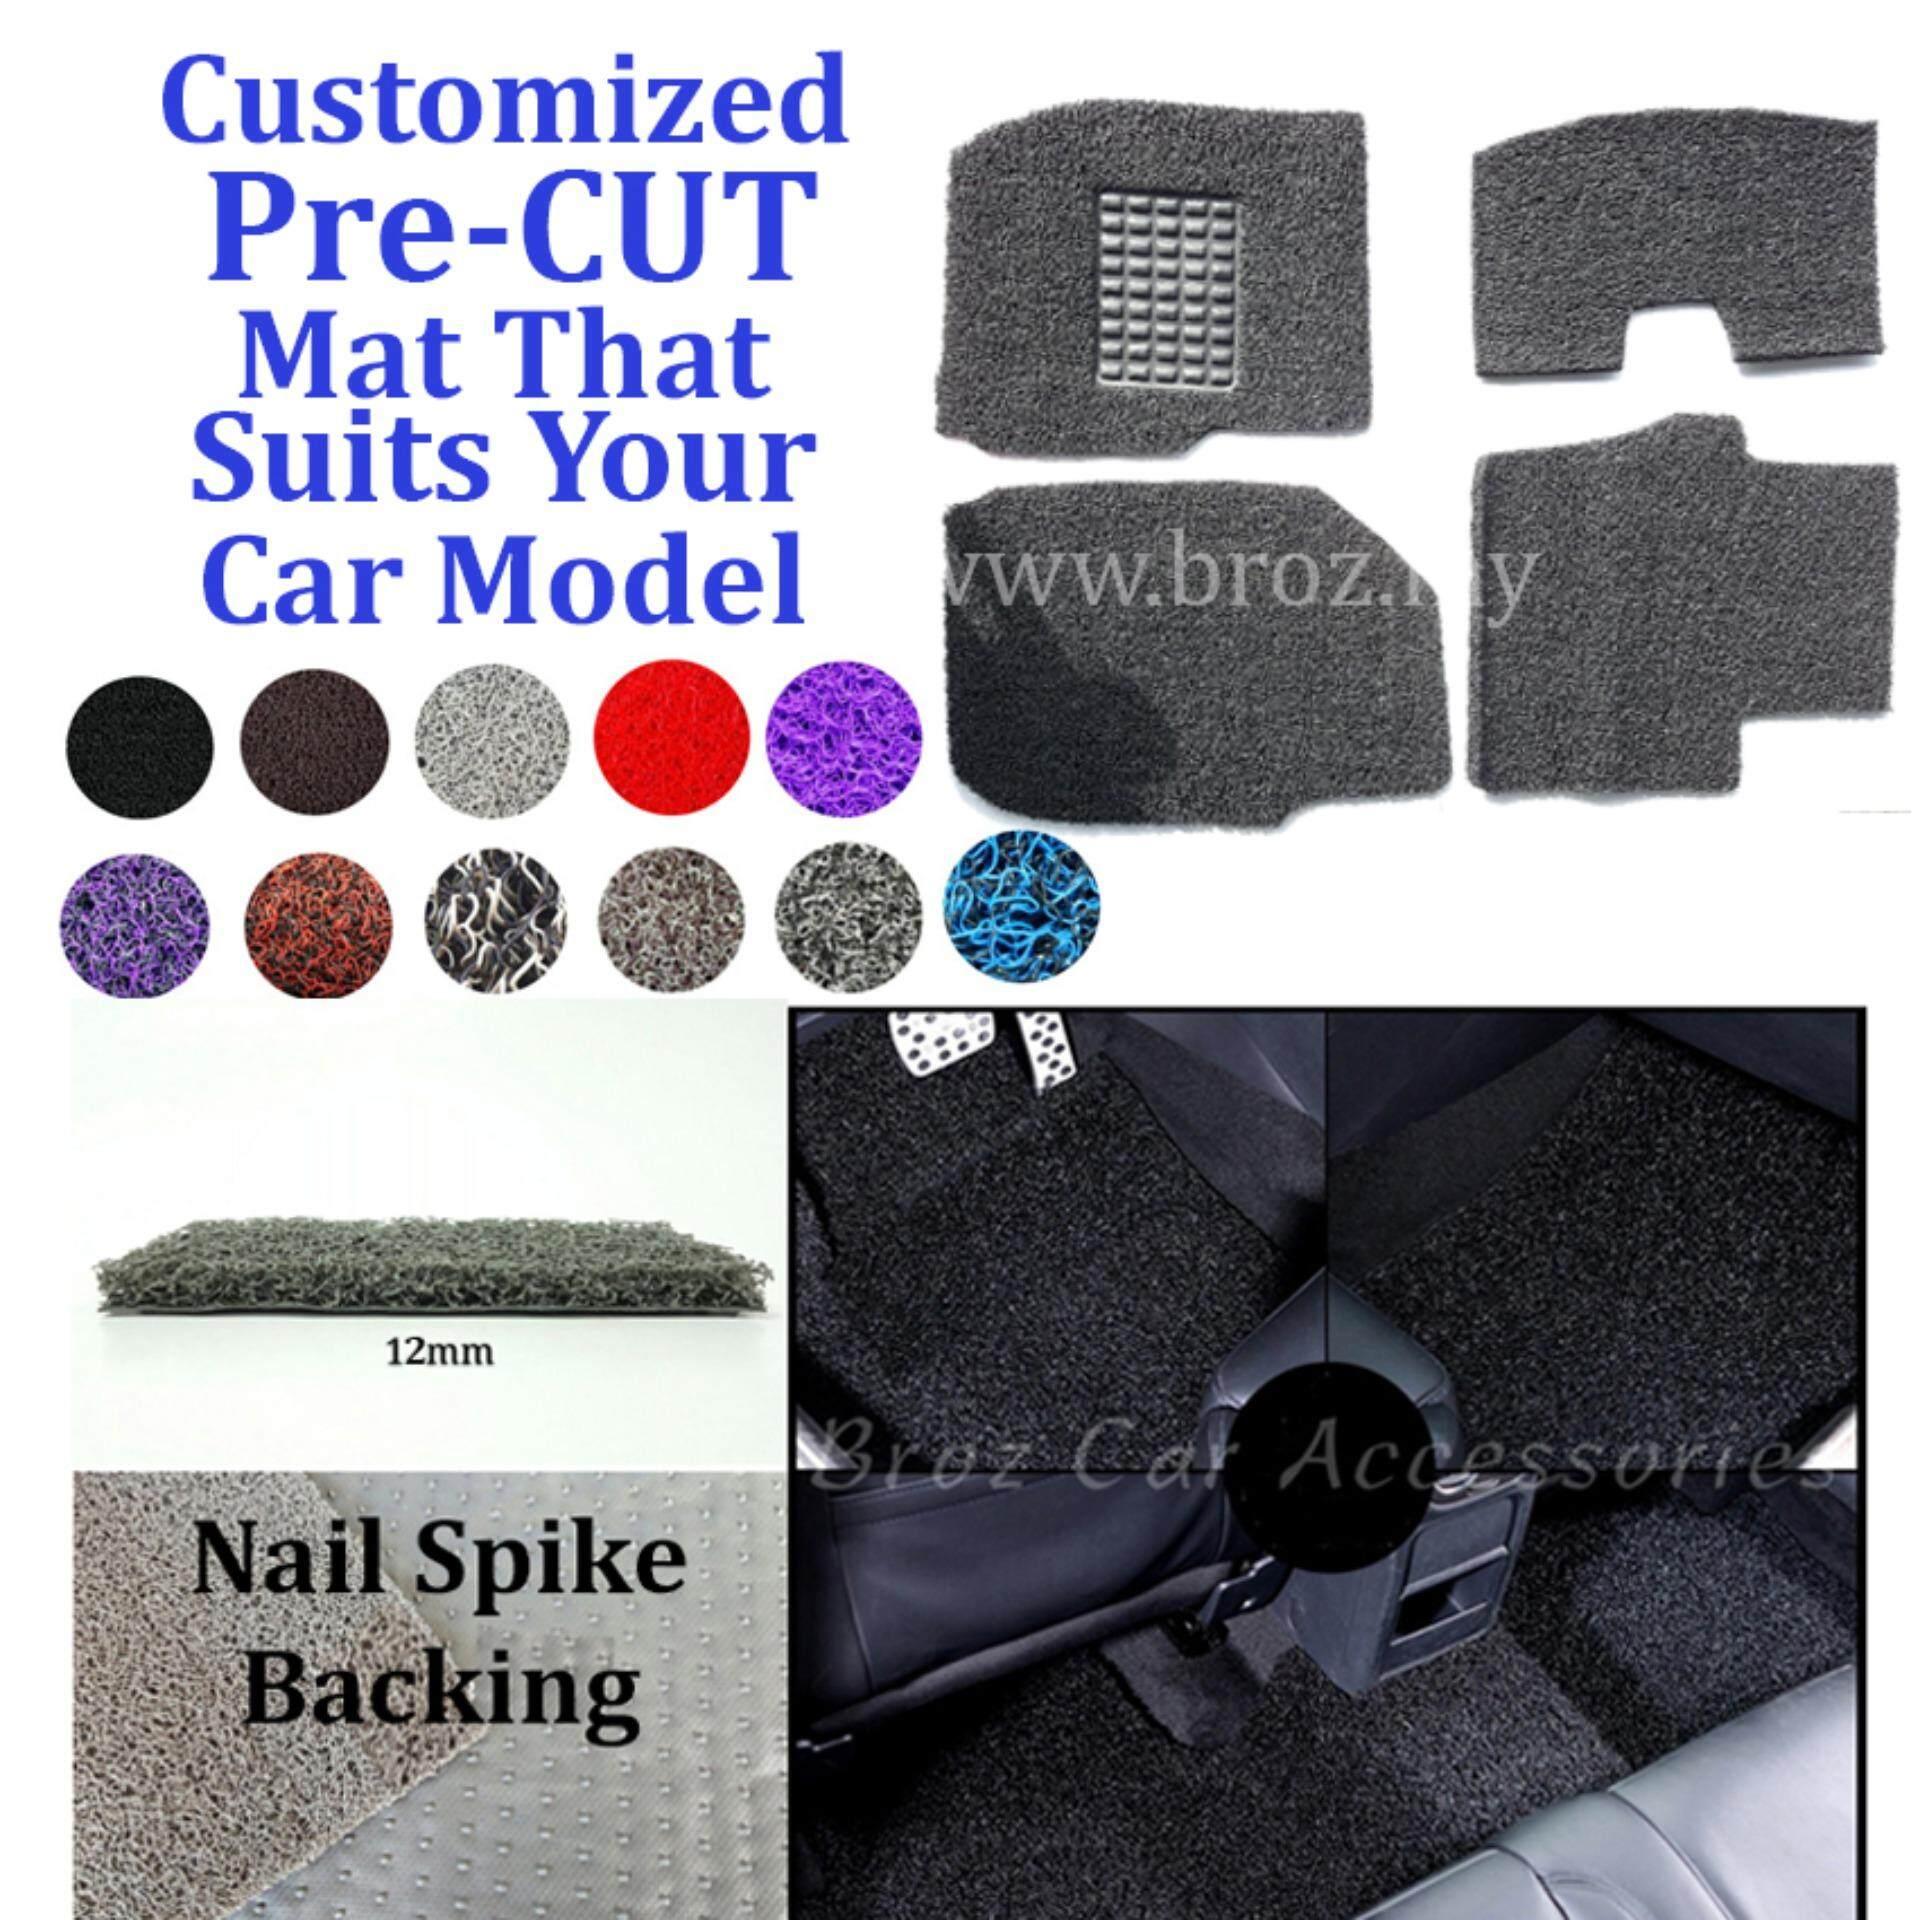 Broz Mercedes E-200 12MM Customized PRE CUT PVC Coil Floor Mat with Driver Rubber Pad Anti Slip Carpet Nail Spike Backing - Grey Black